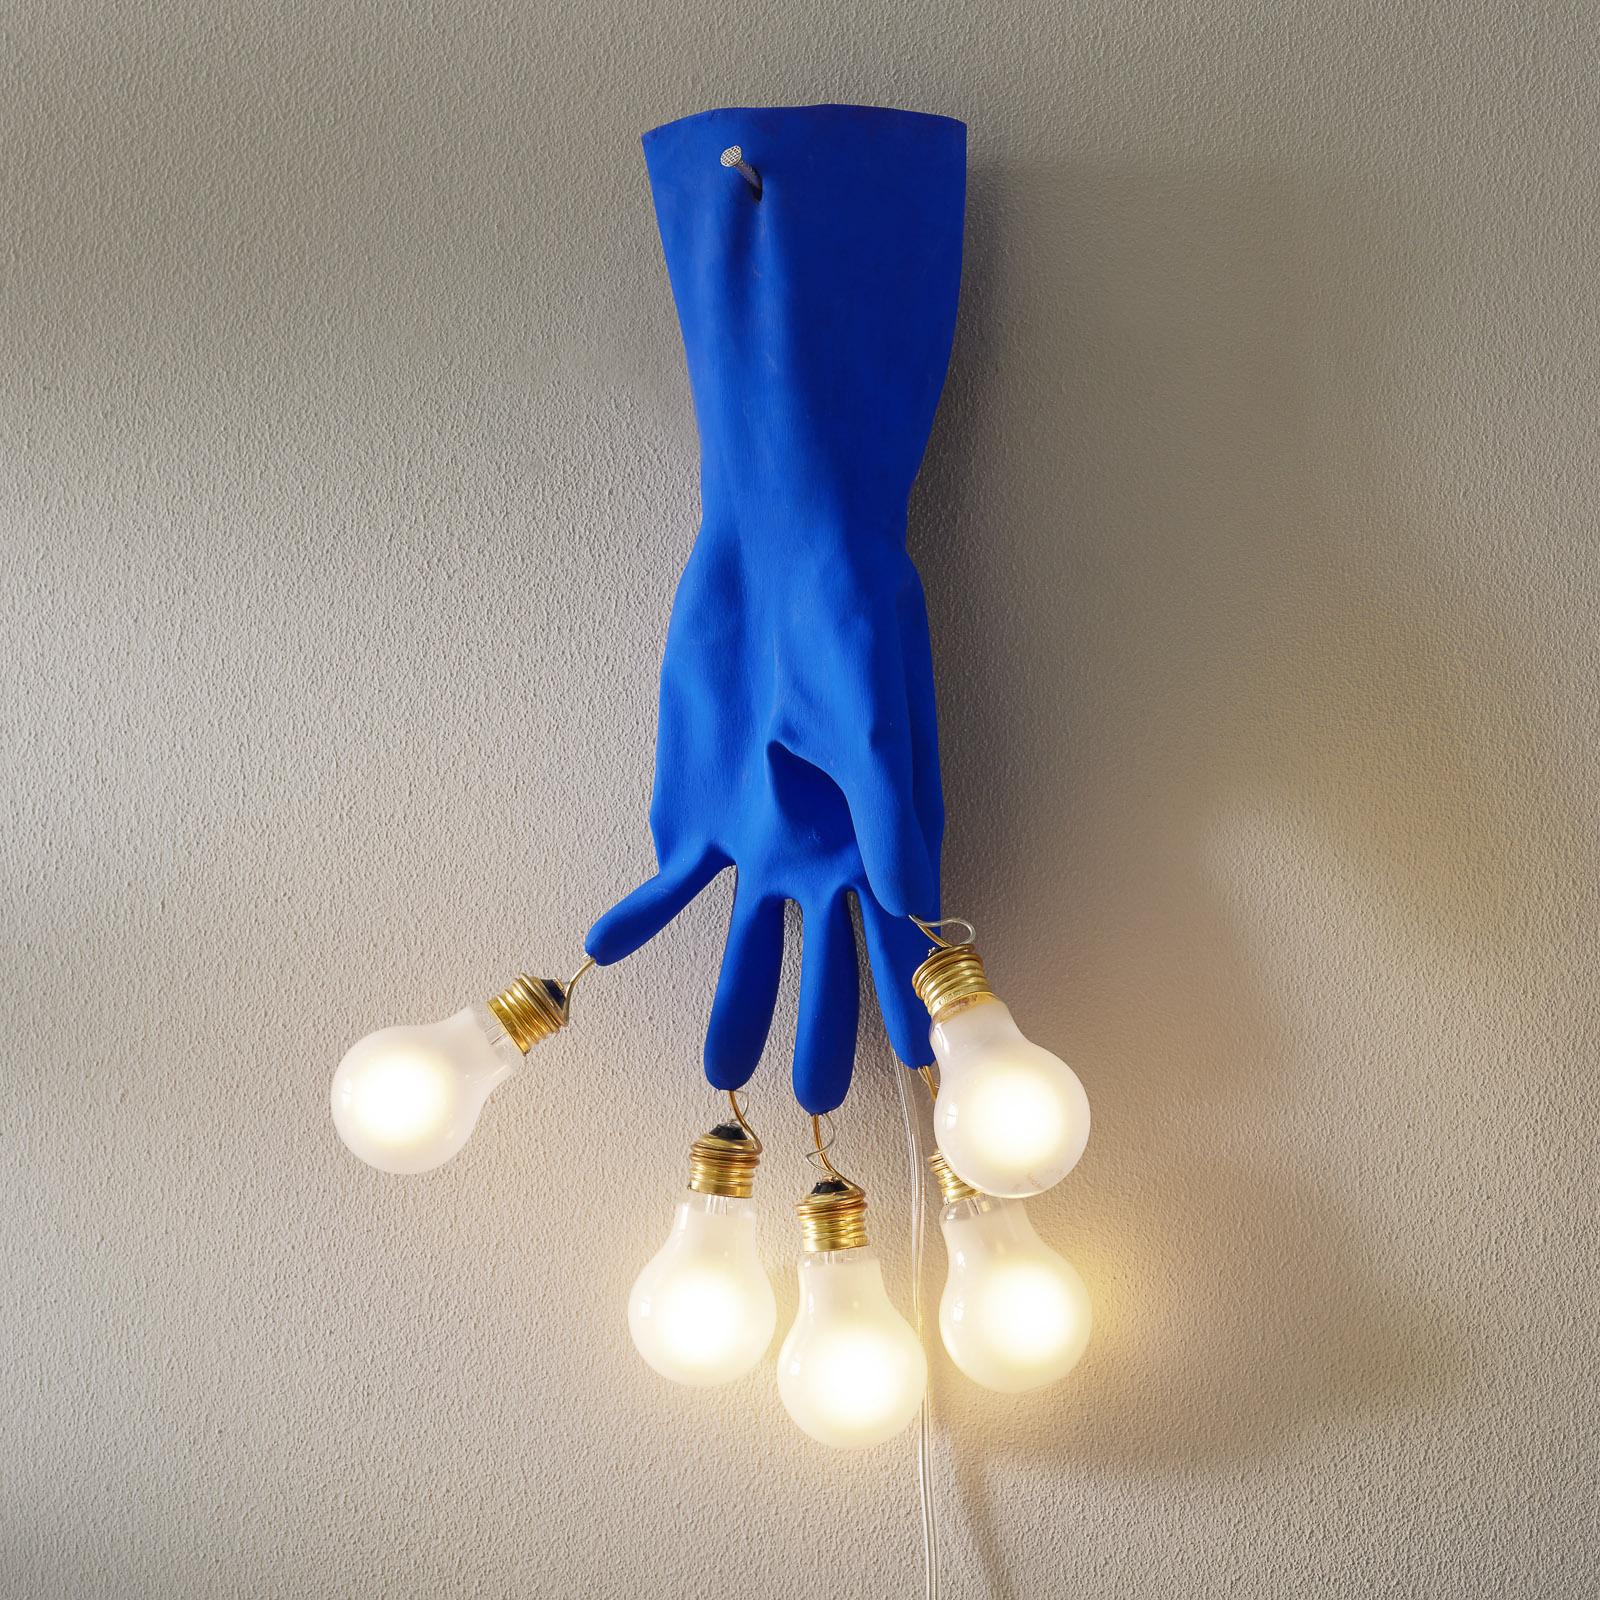 Ingo Maurer Luzy on the Wall aplique LED